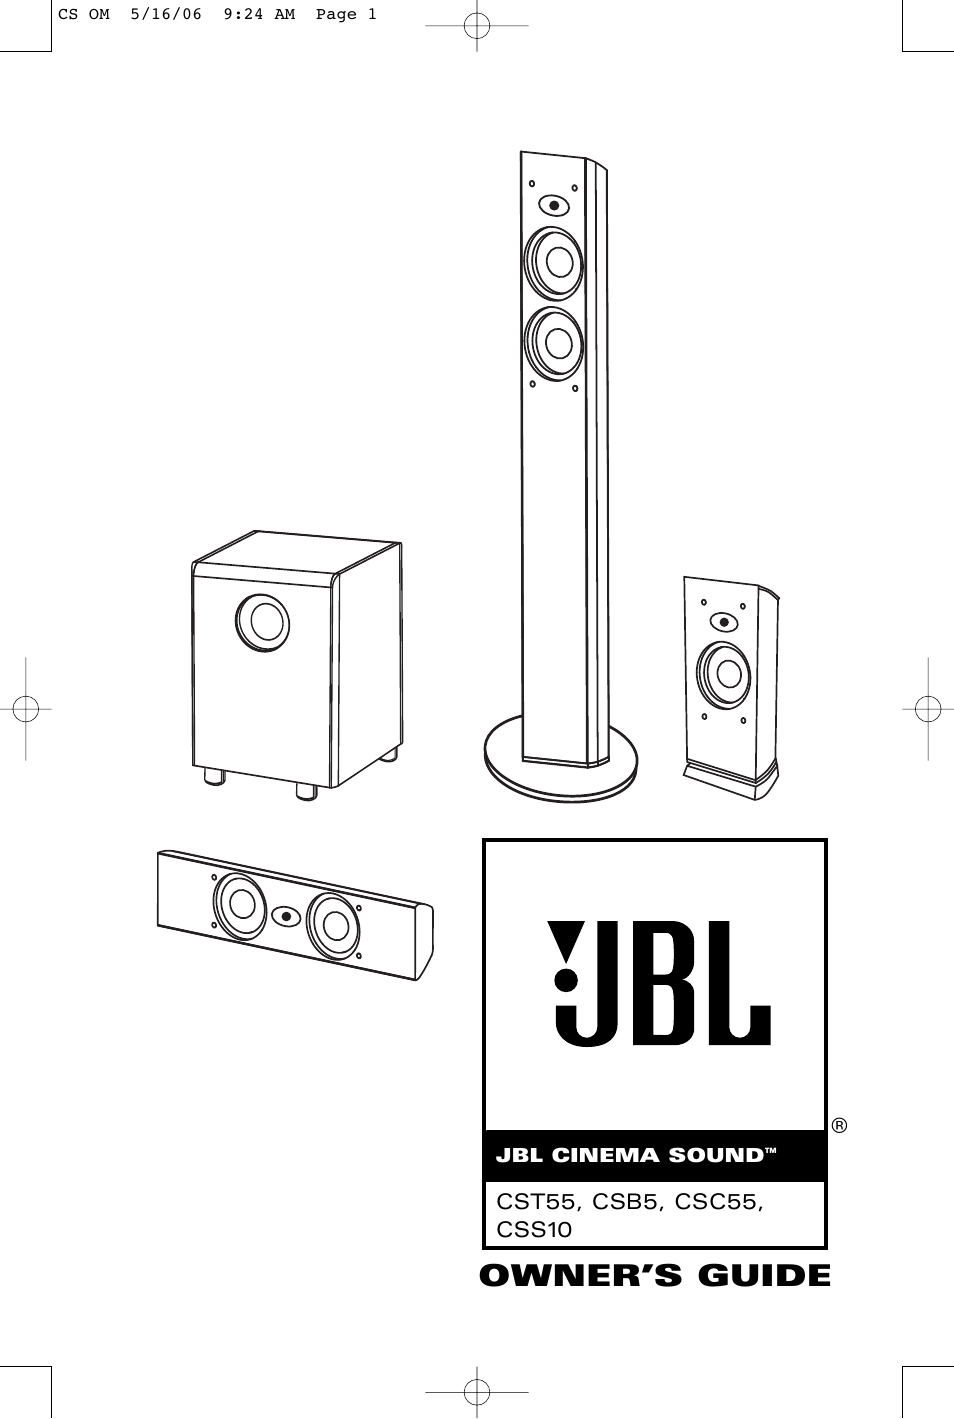 jbl css10 user manual 12 pages rh manualsdir com